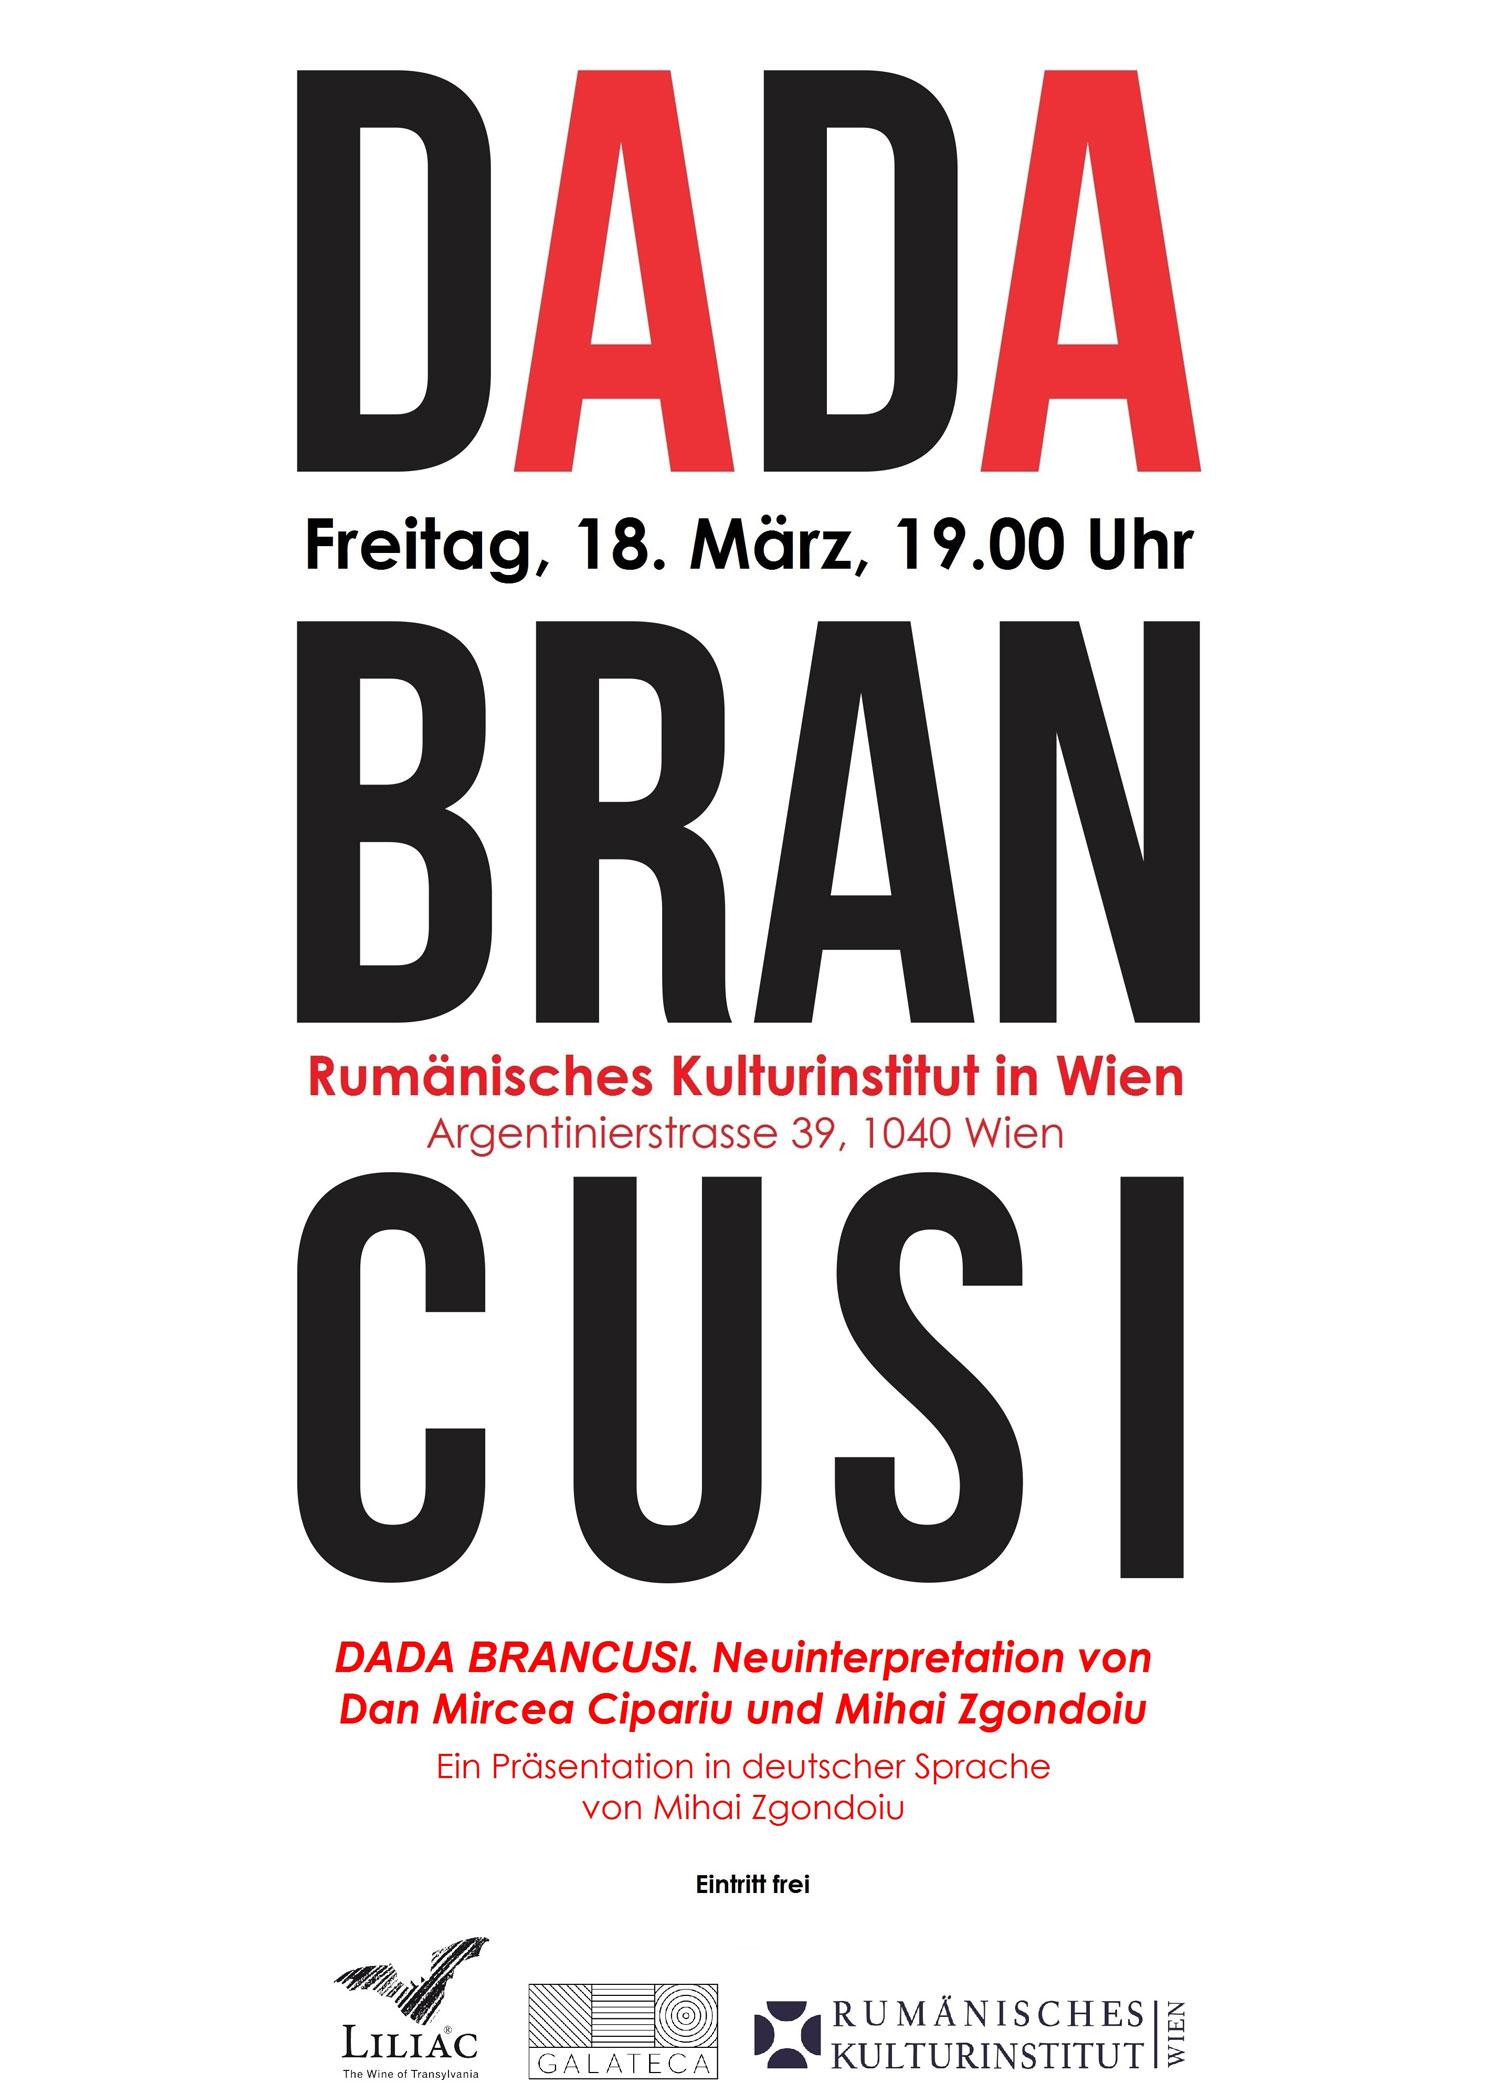 Plakat-DADA-BRANCUSI